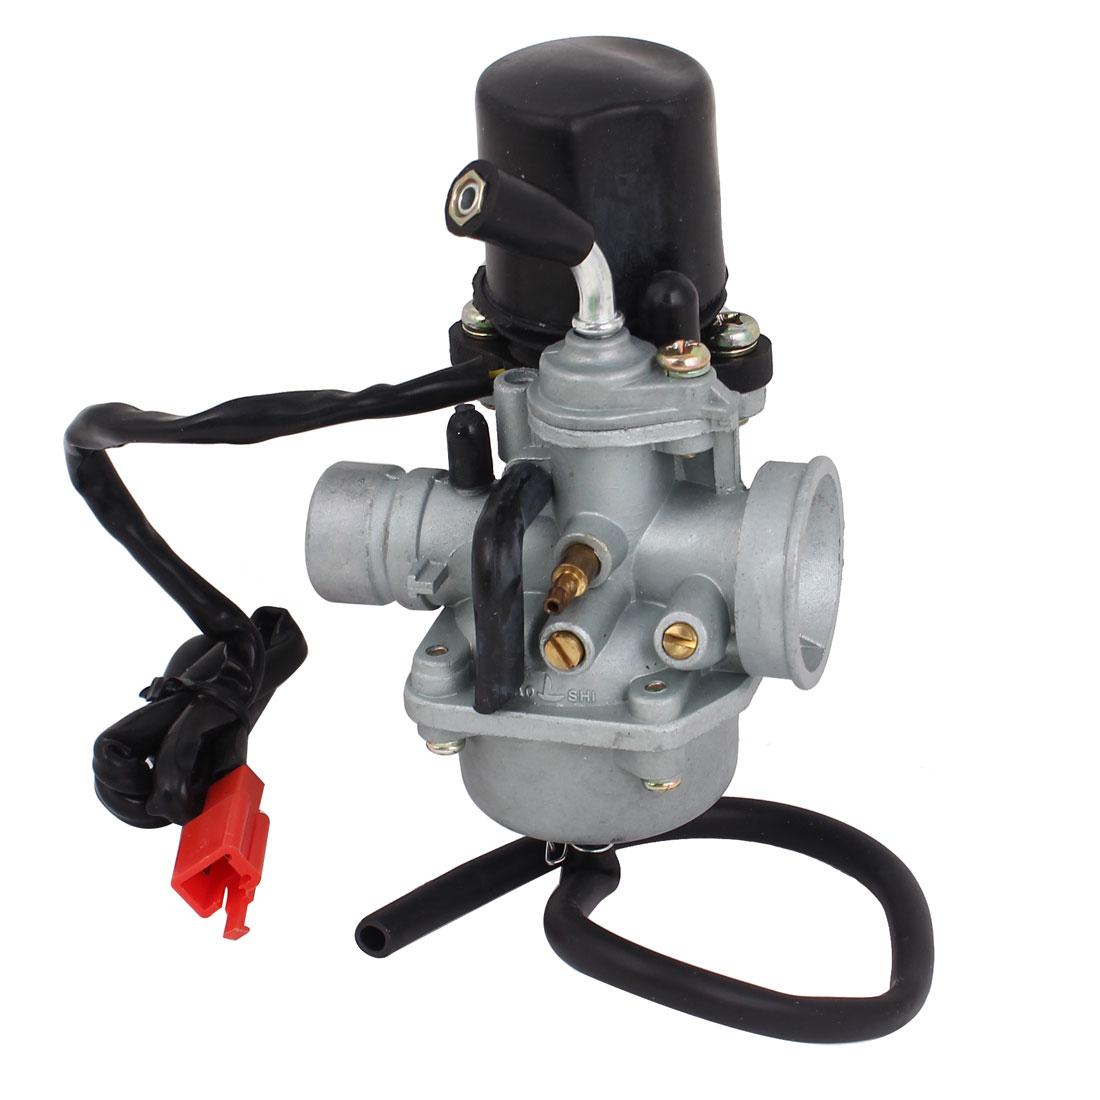 Motorcycle Engine Lawn Mower Parts Generator Water Pump Carburetor for Yamaha